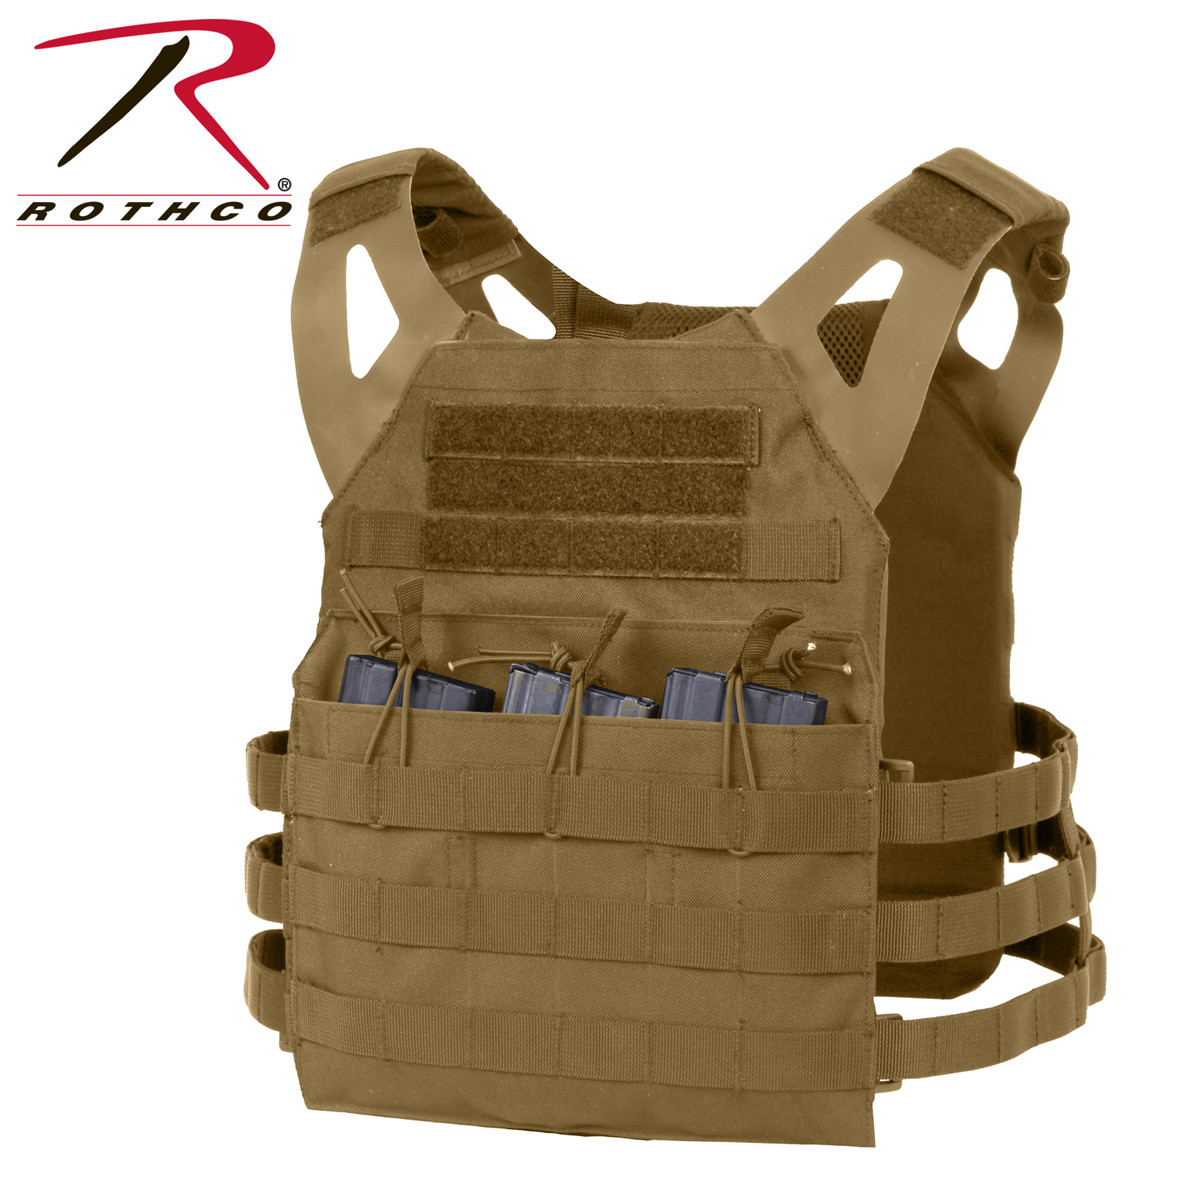 ce08edb589dd5 Shop Lightweight Carriers Vest - Fatigues Army Navy Gear